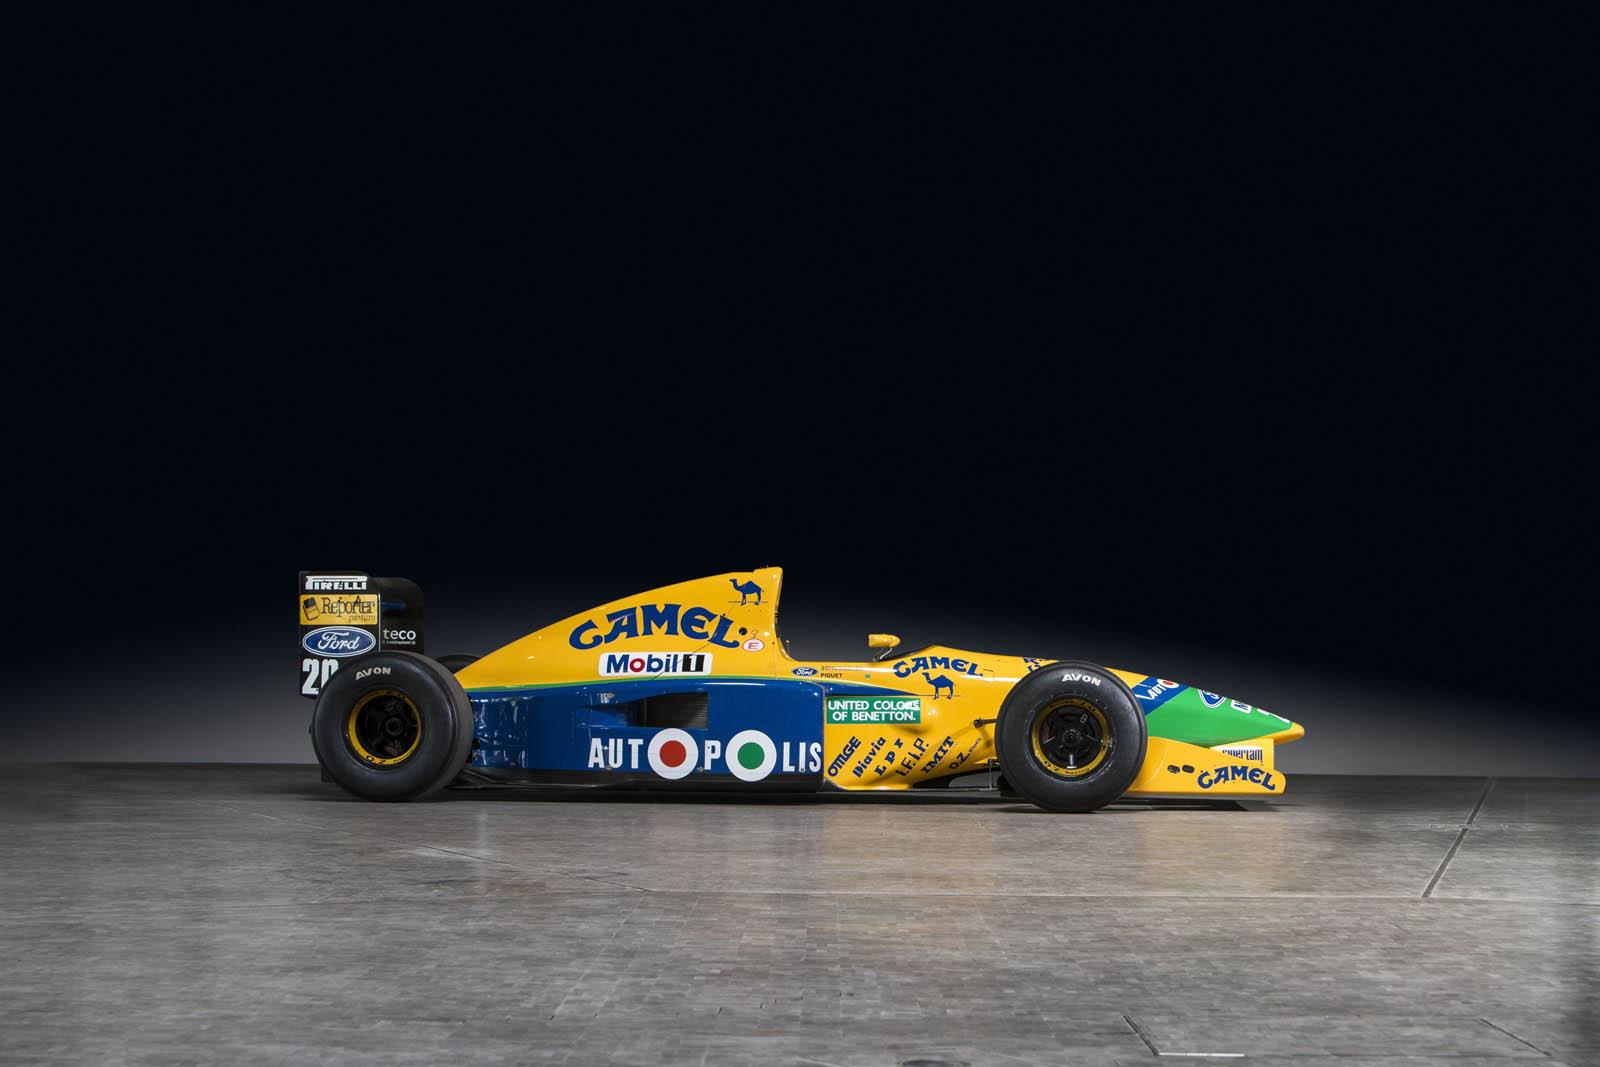 1991_Benetton-Ford_B191_12